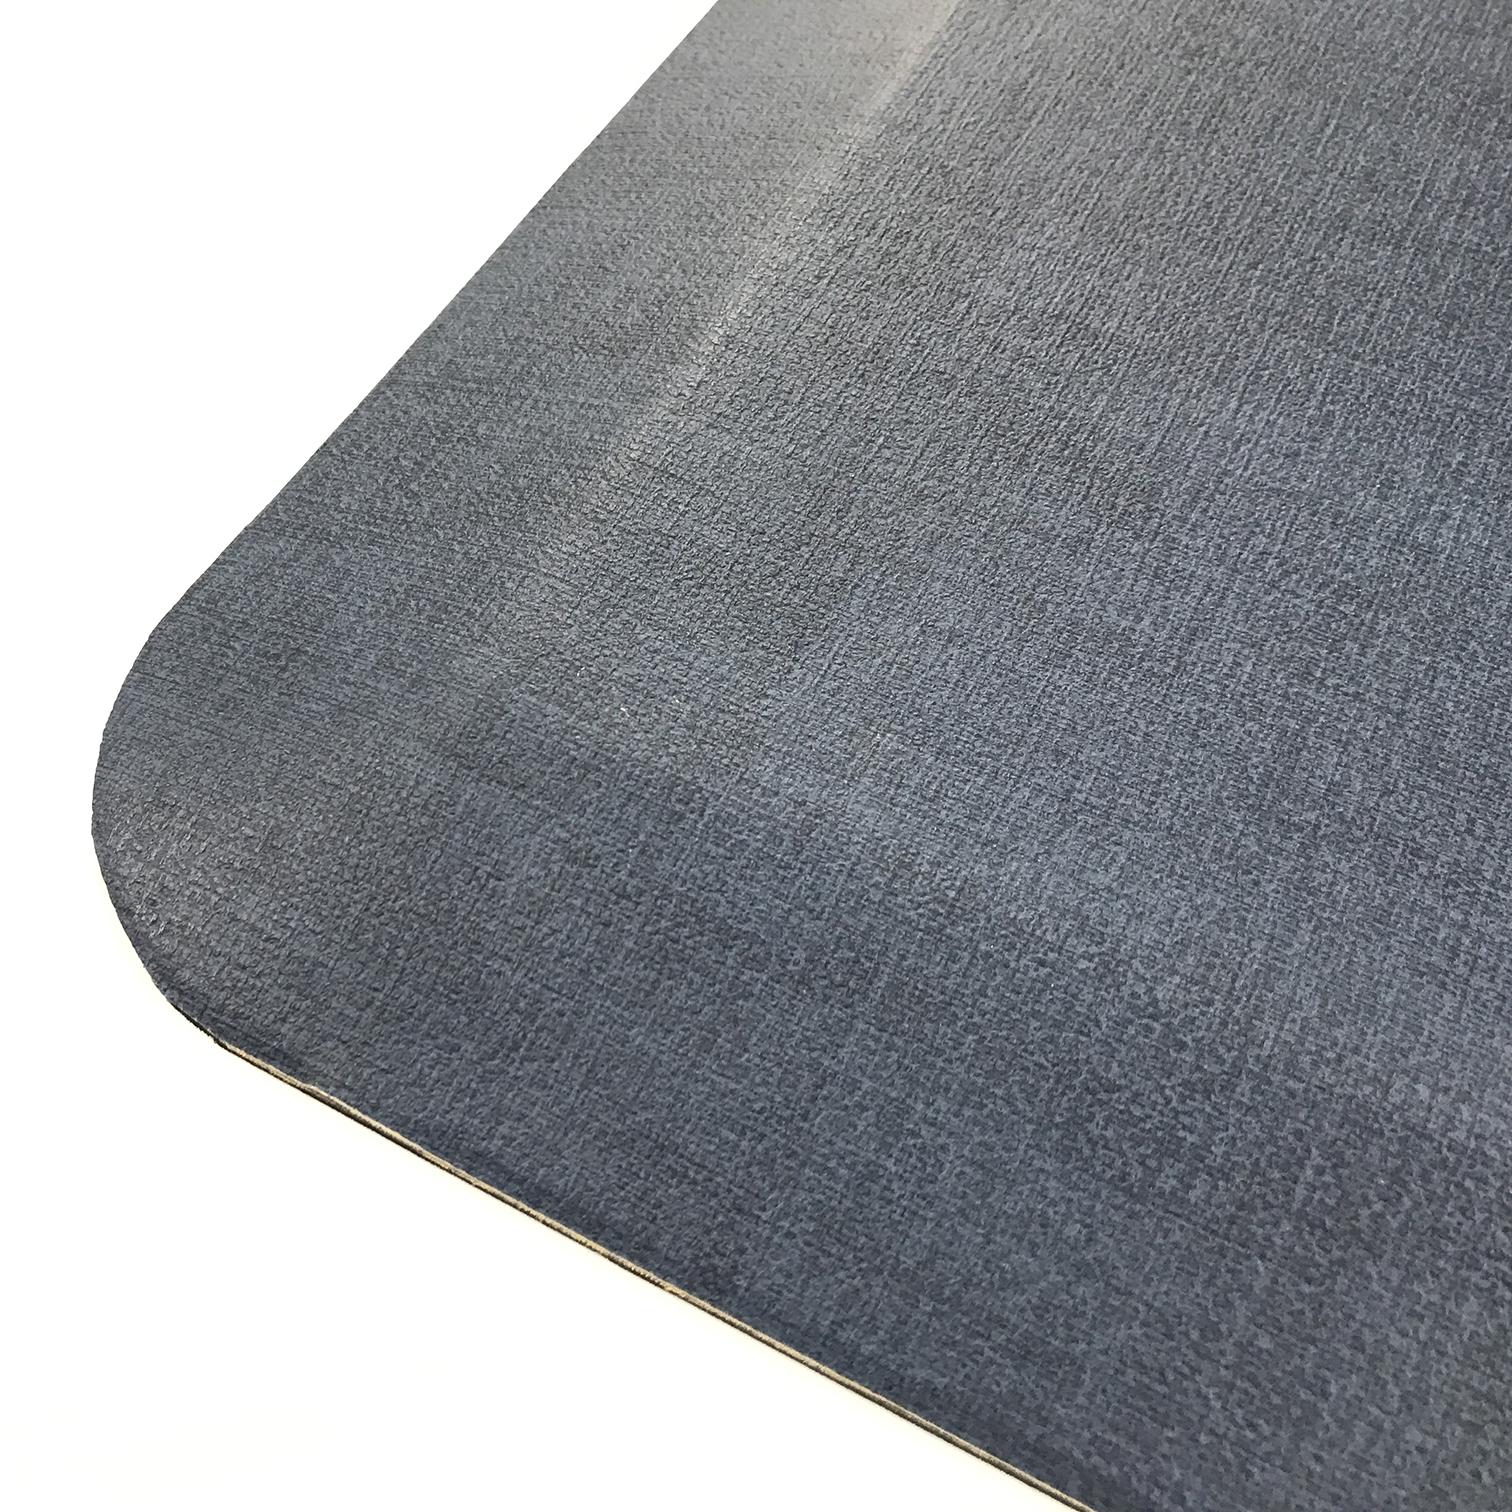 Black Grey Rubber Anti Fatigue Mat Pu Pvc Standing Desk